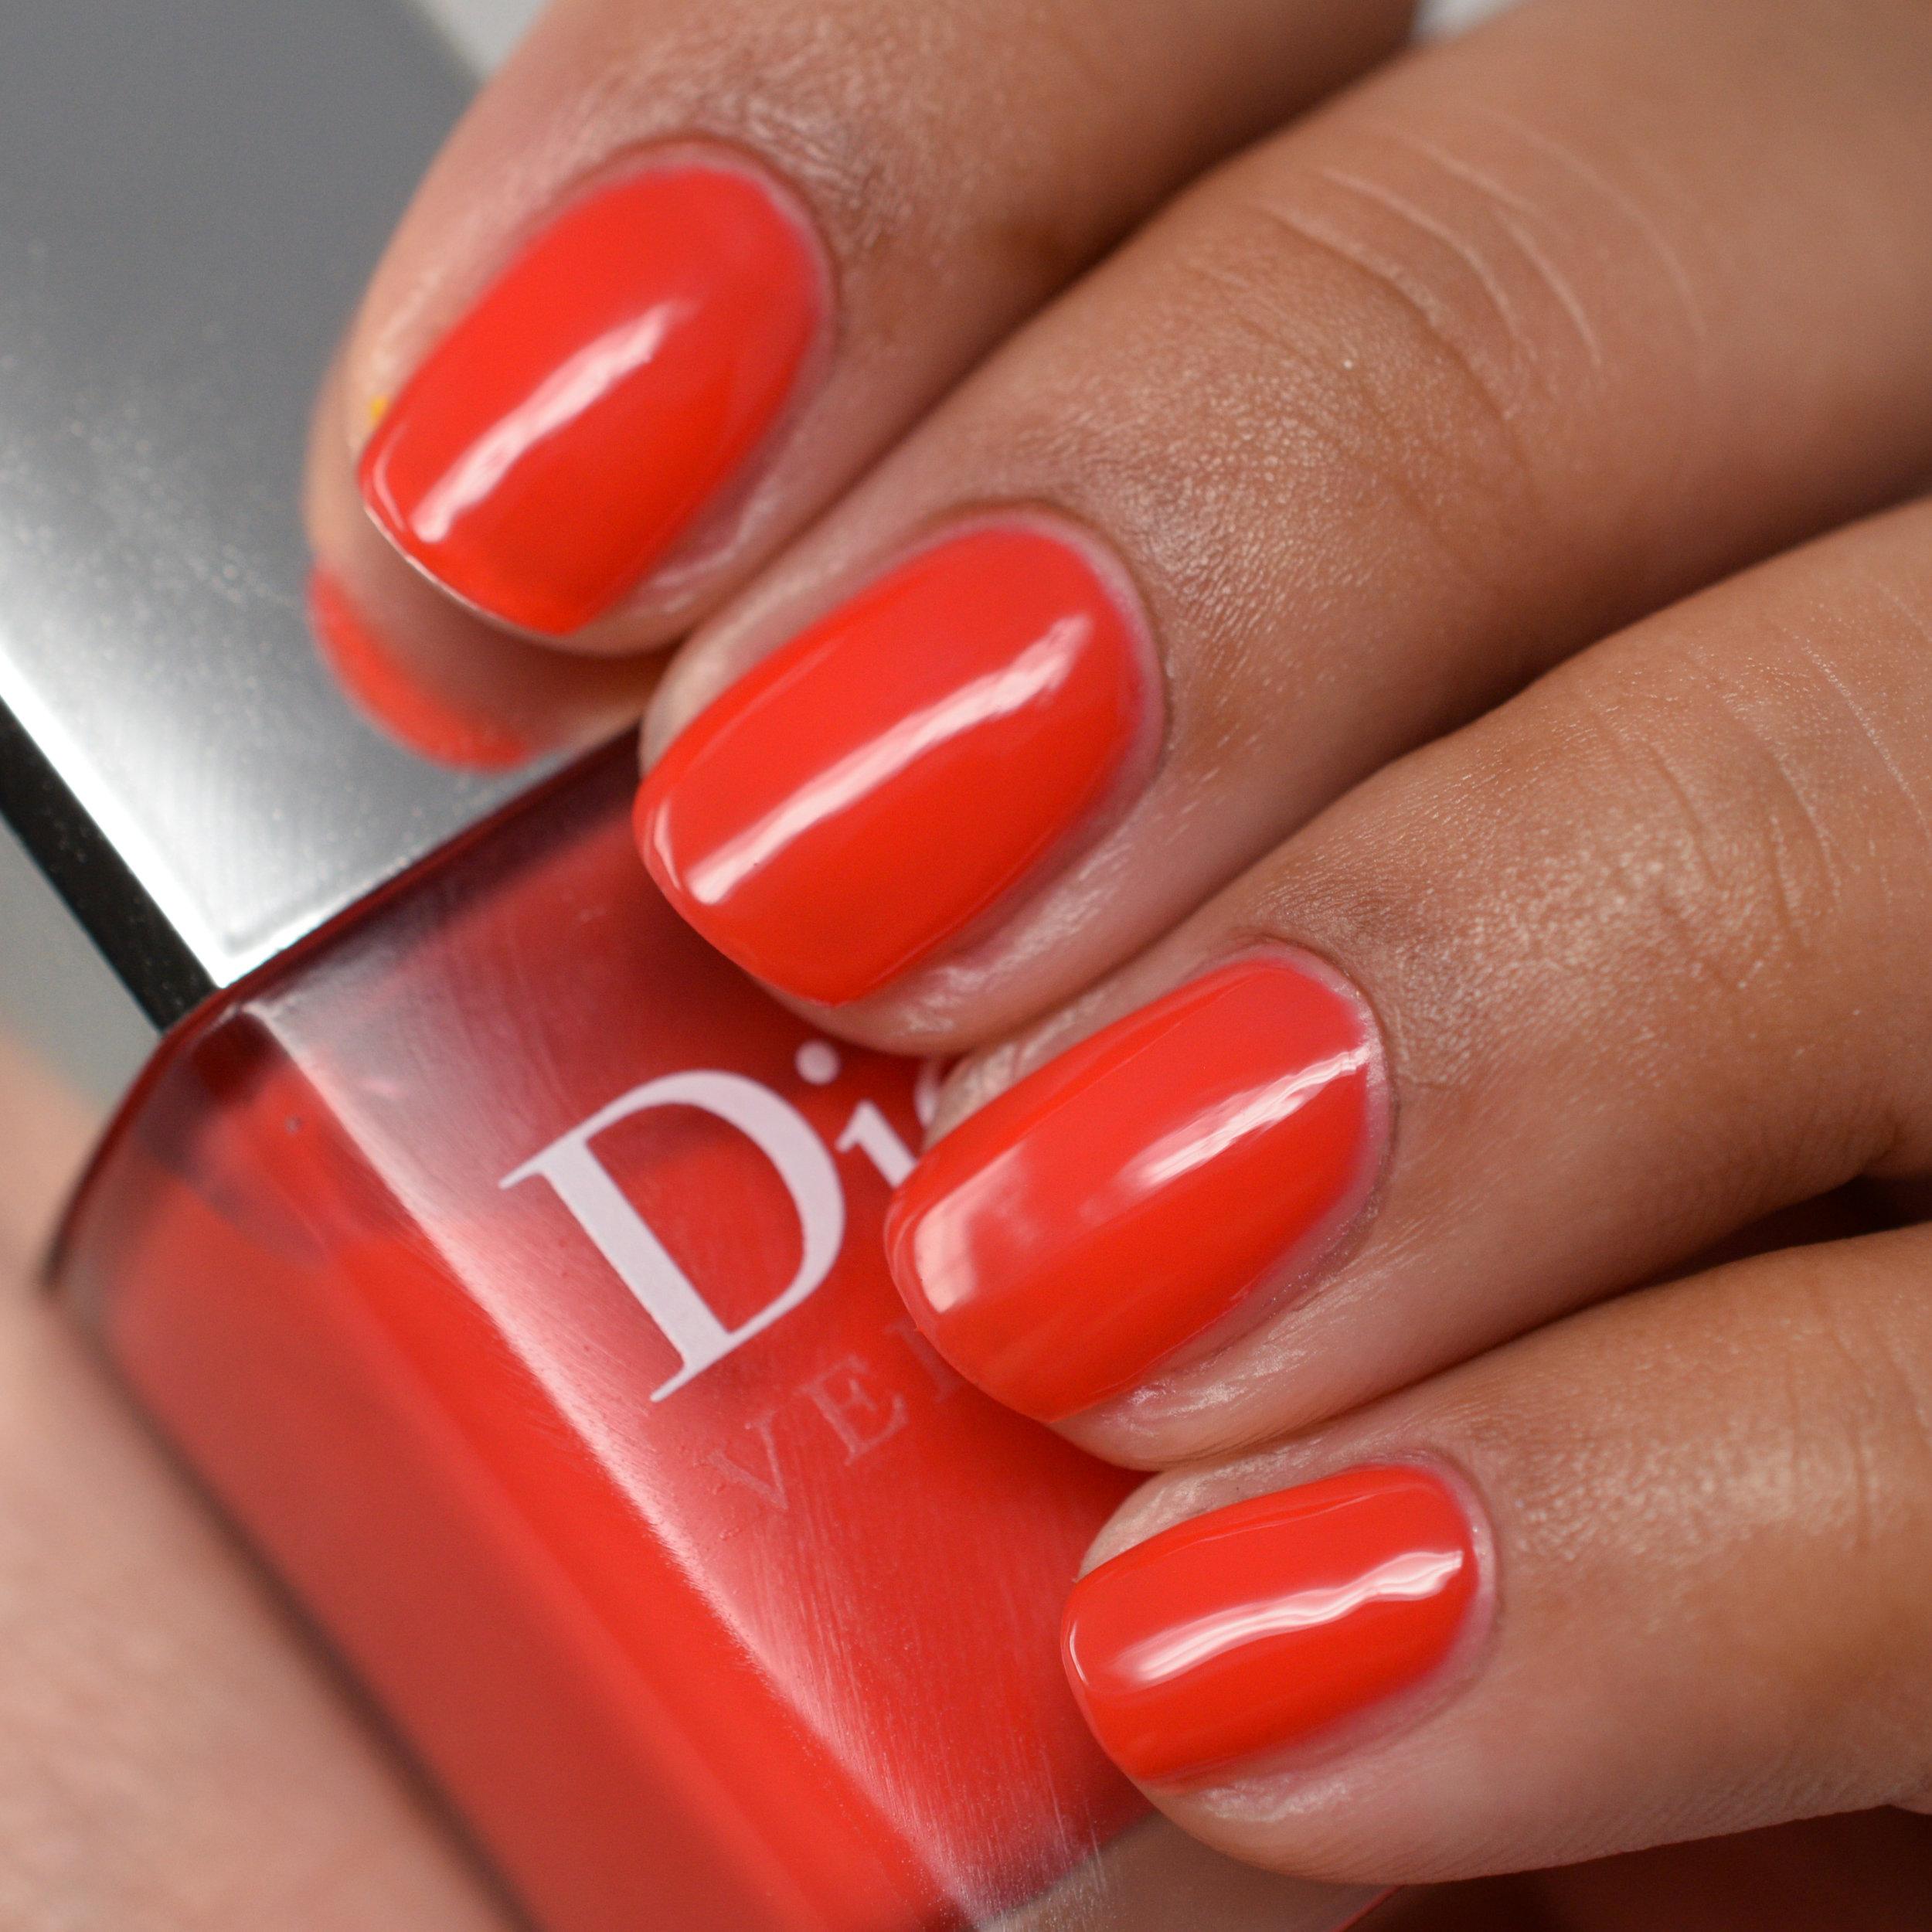 Dior Vernis Summer Mix Summer 2012 - Calypso.jpg